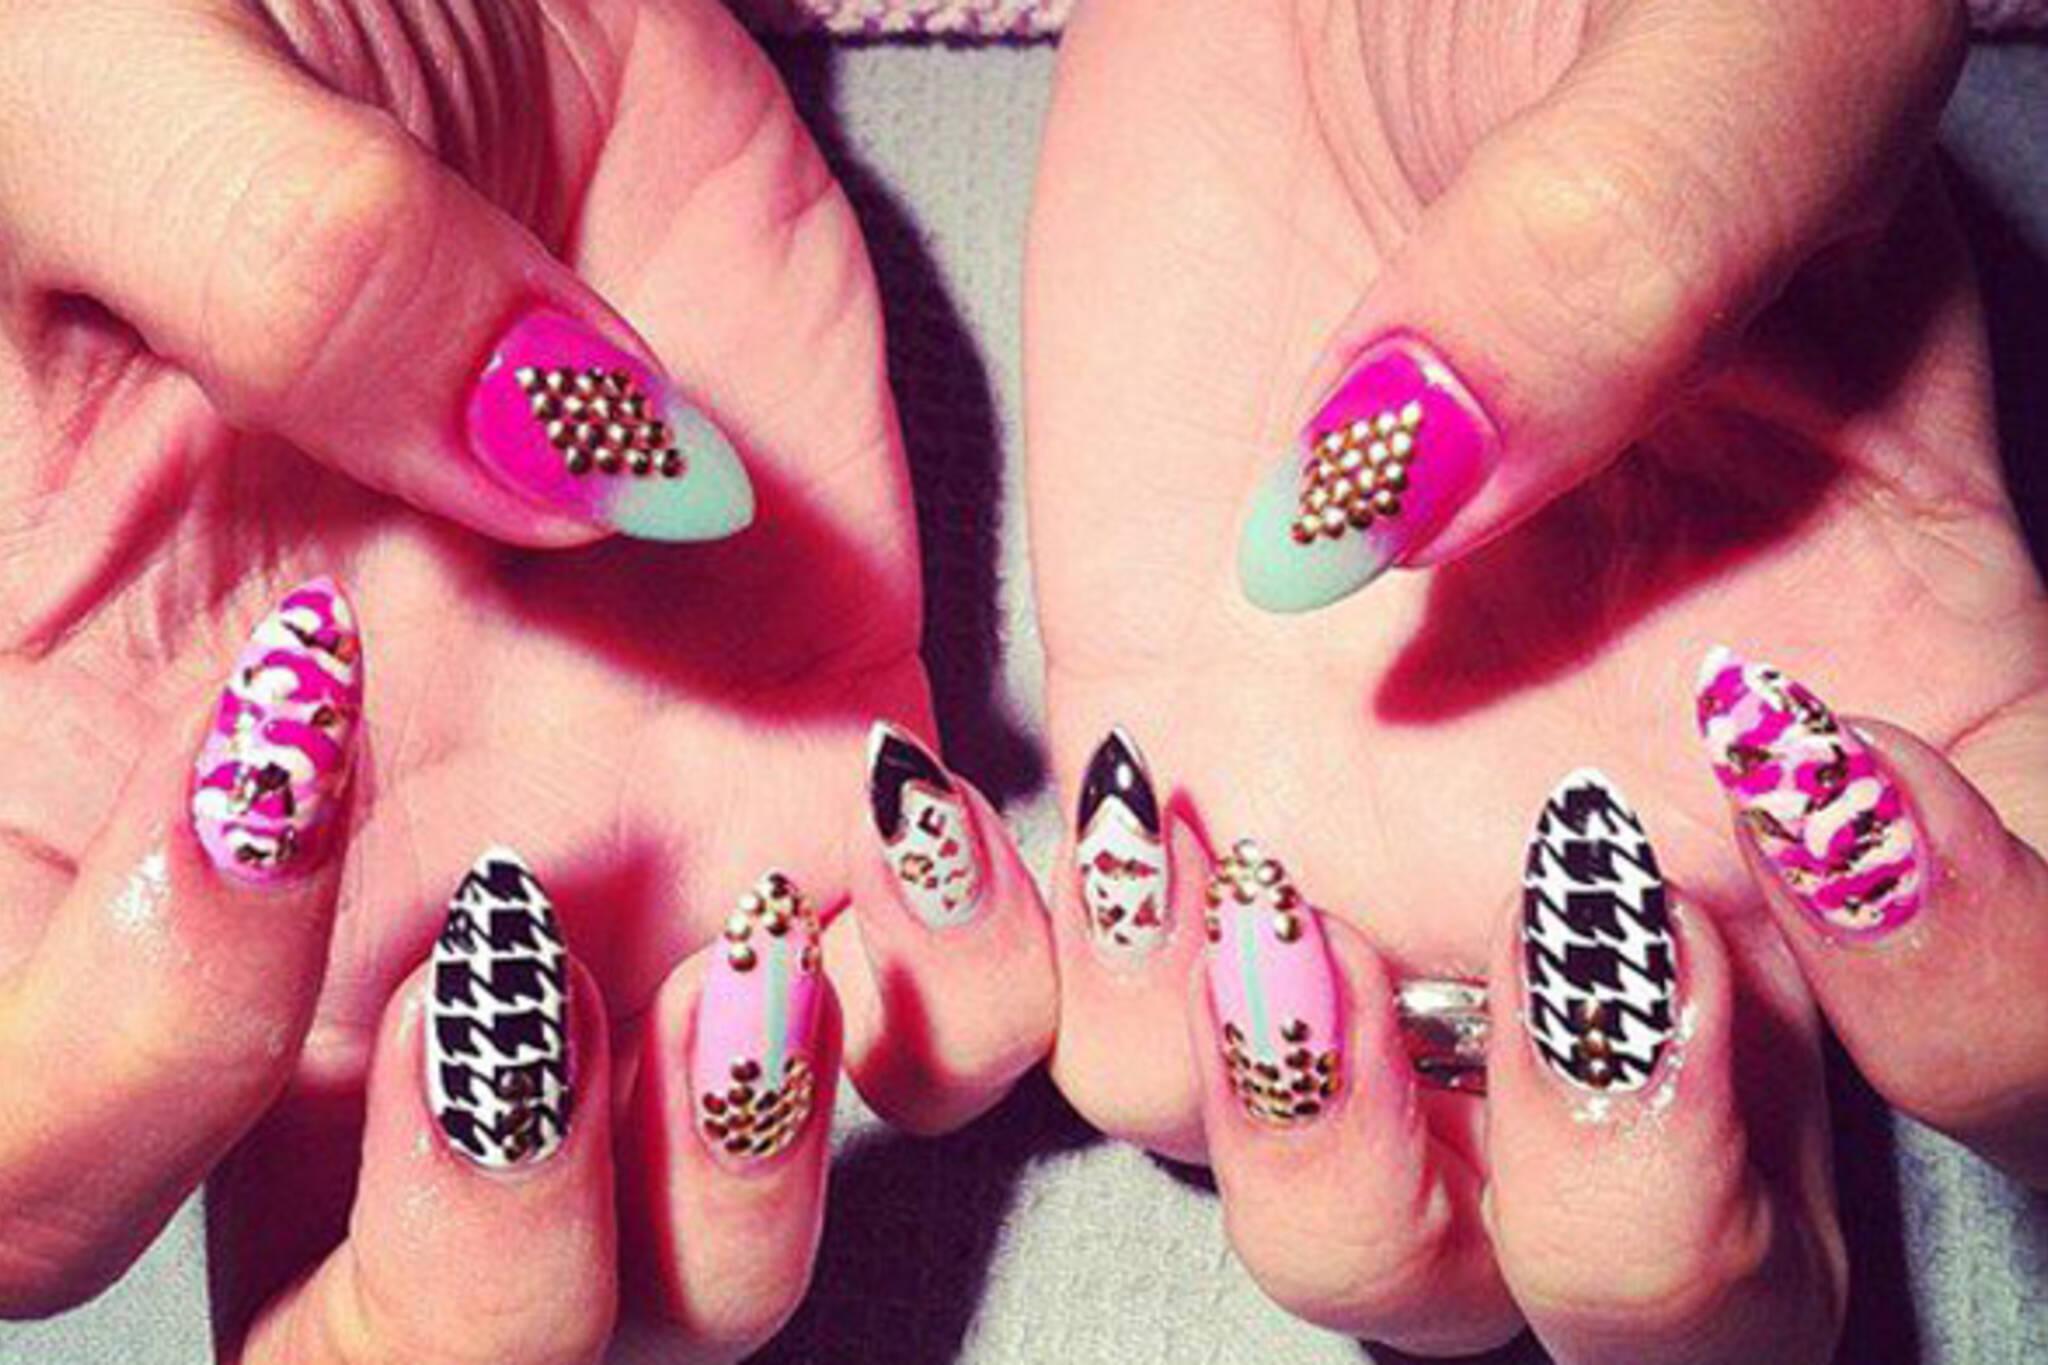 pinkys nails toronto